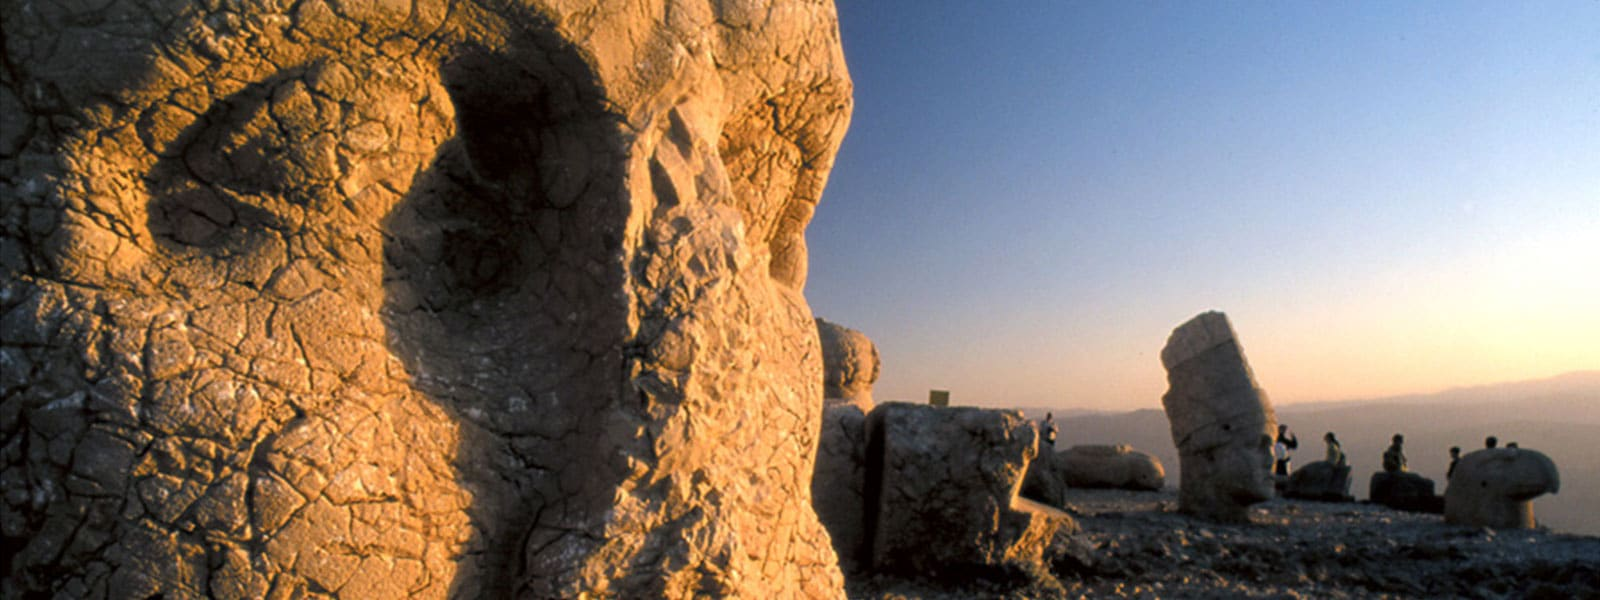 Mount Nemrut National Park